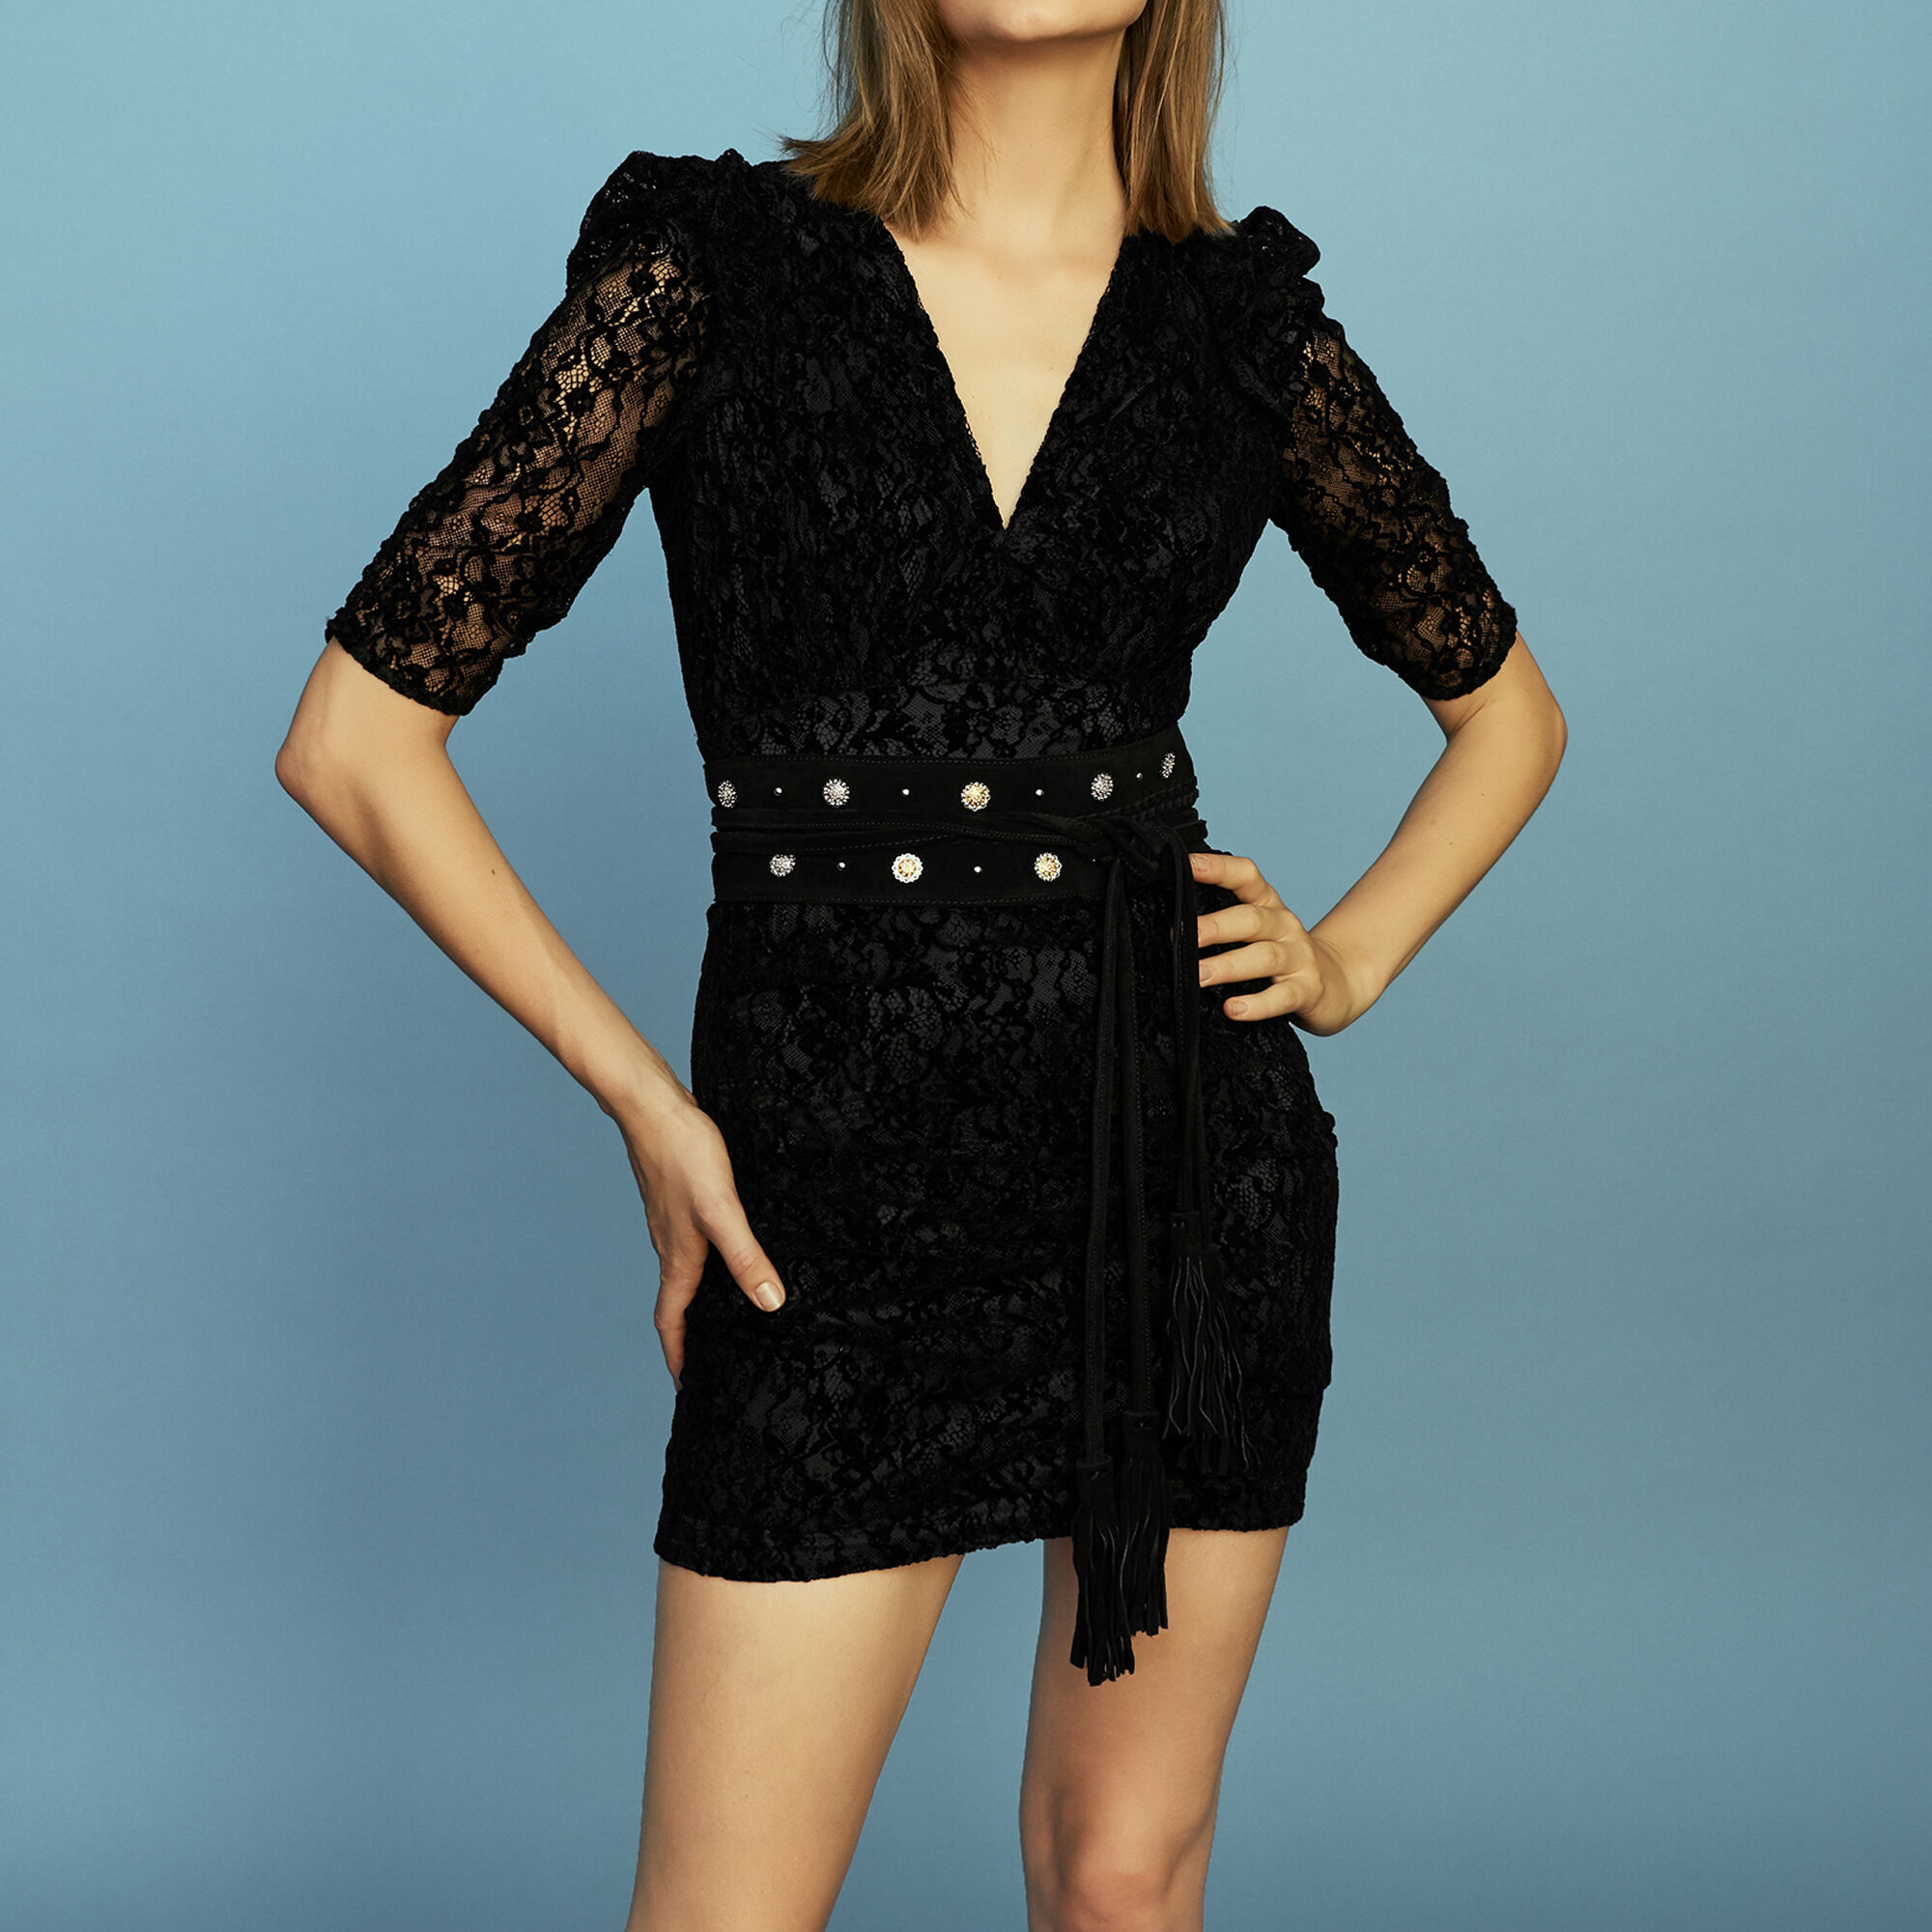 Dresses Maje À Féminin Blackfriday 1 De Paris ch Porter Prêt 8qP14vwE